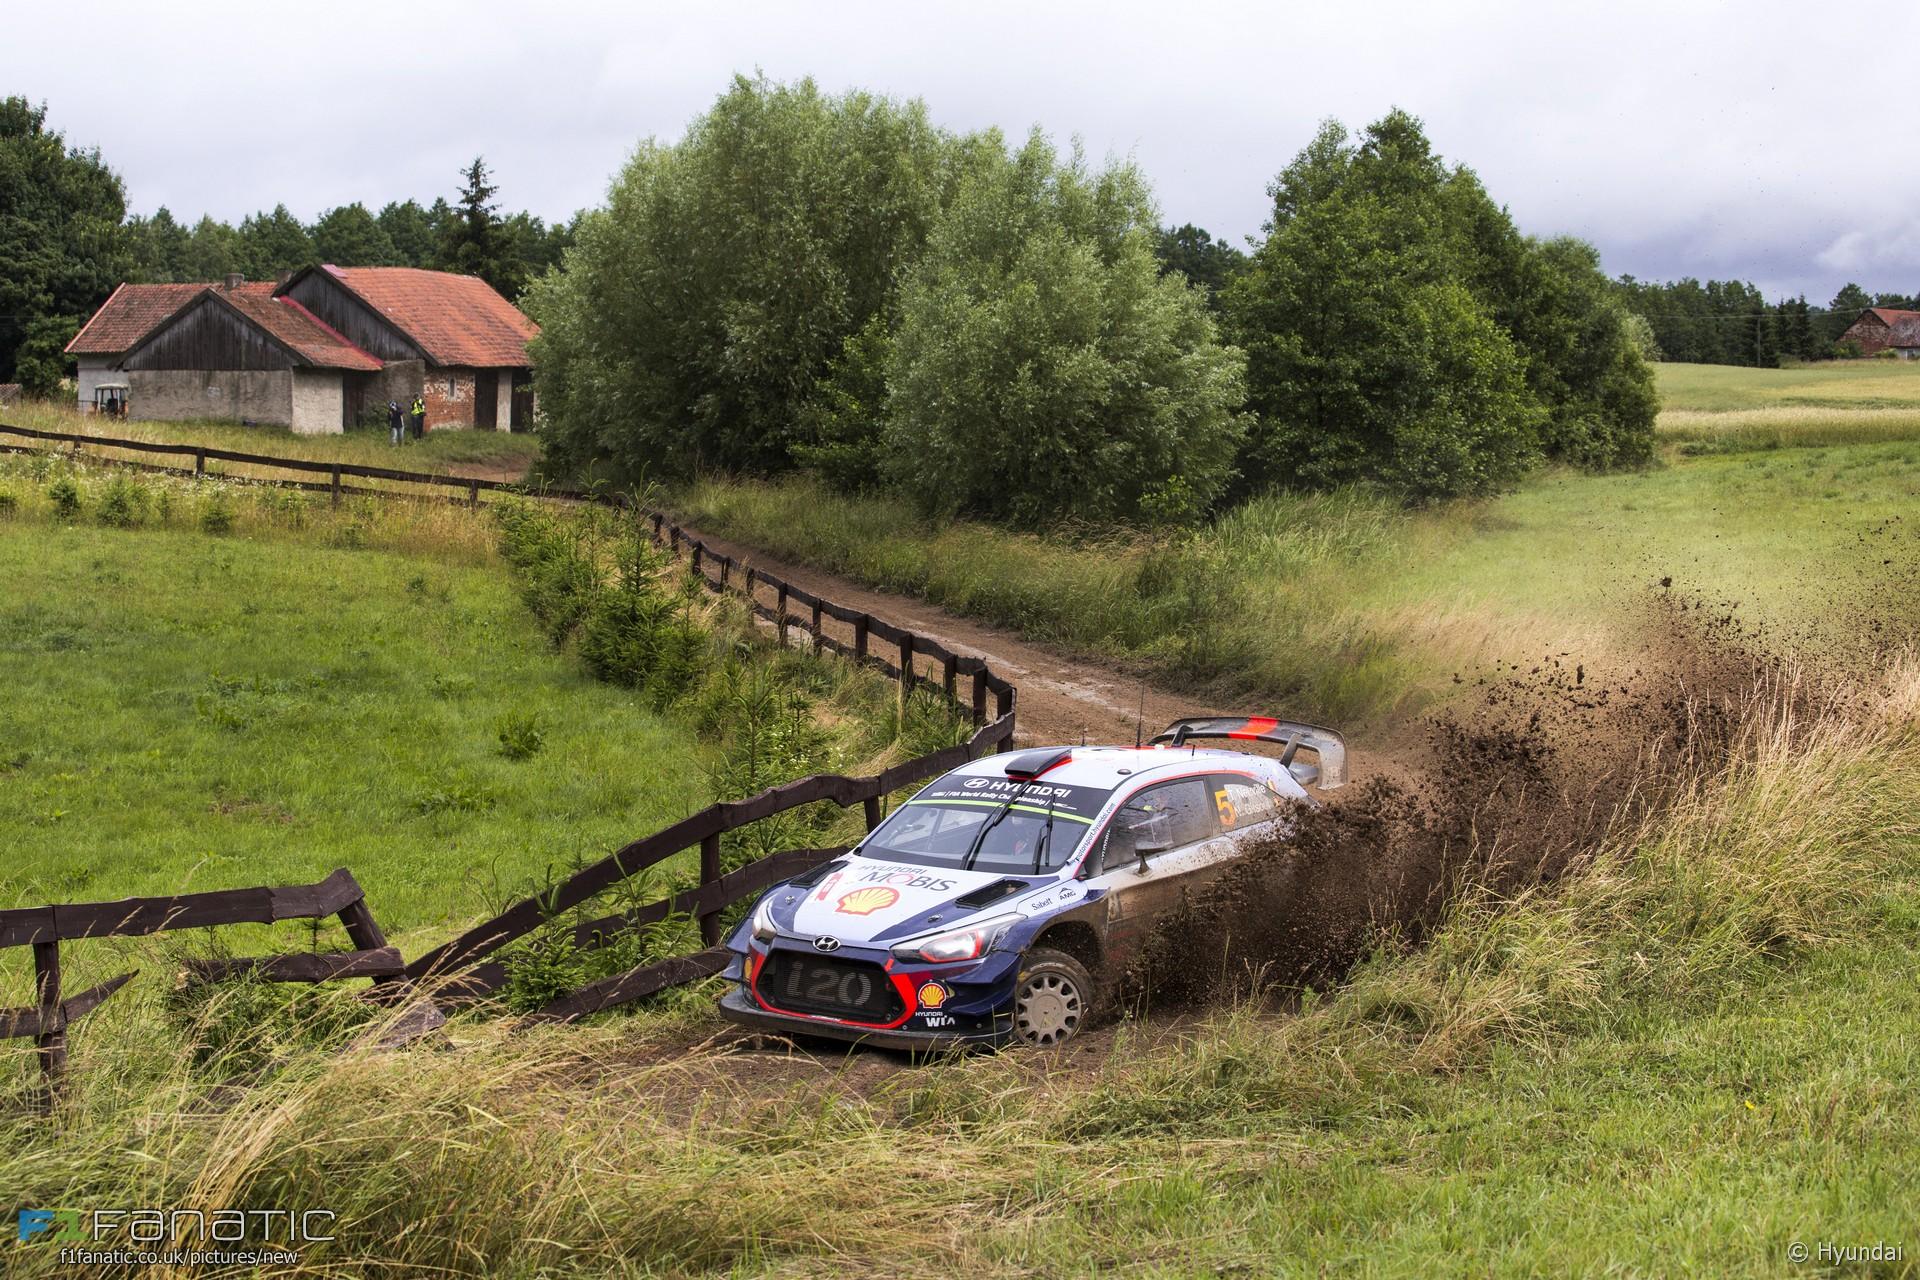 Thierry Neuville, Hyundai i20, Rally Poland, 2017